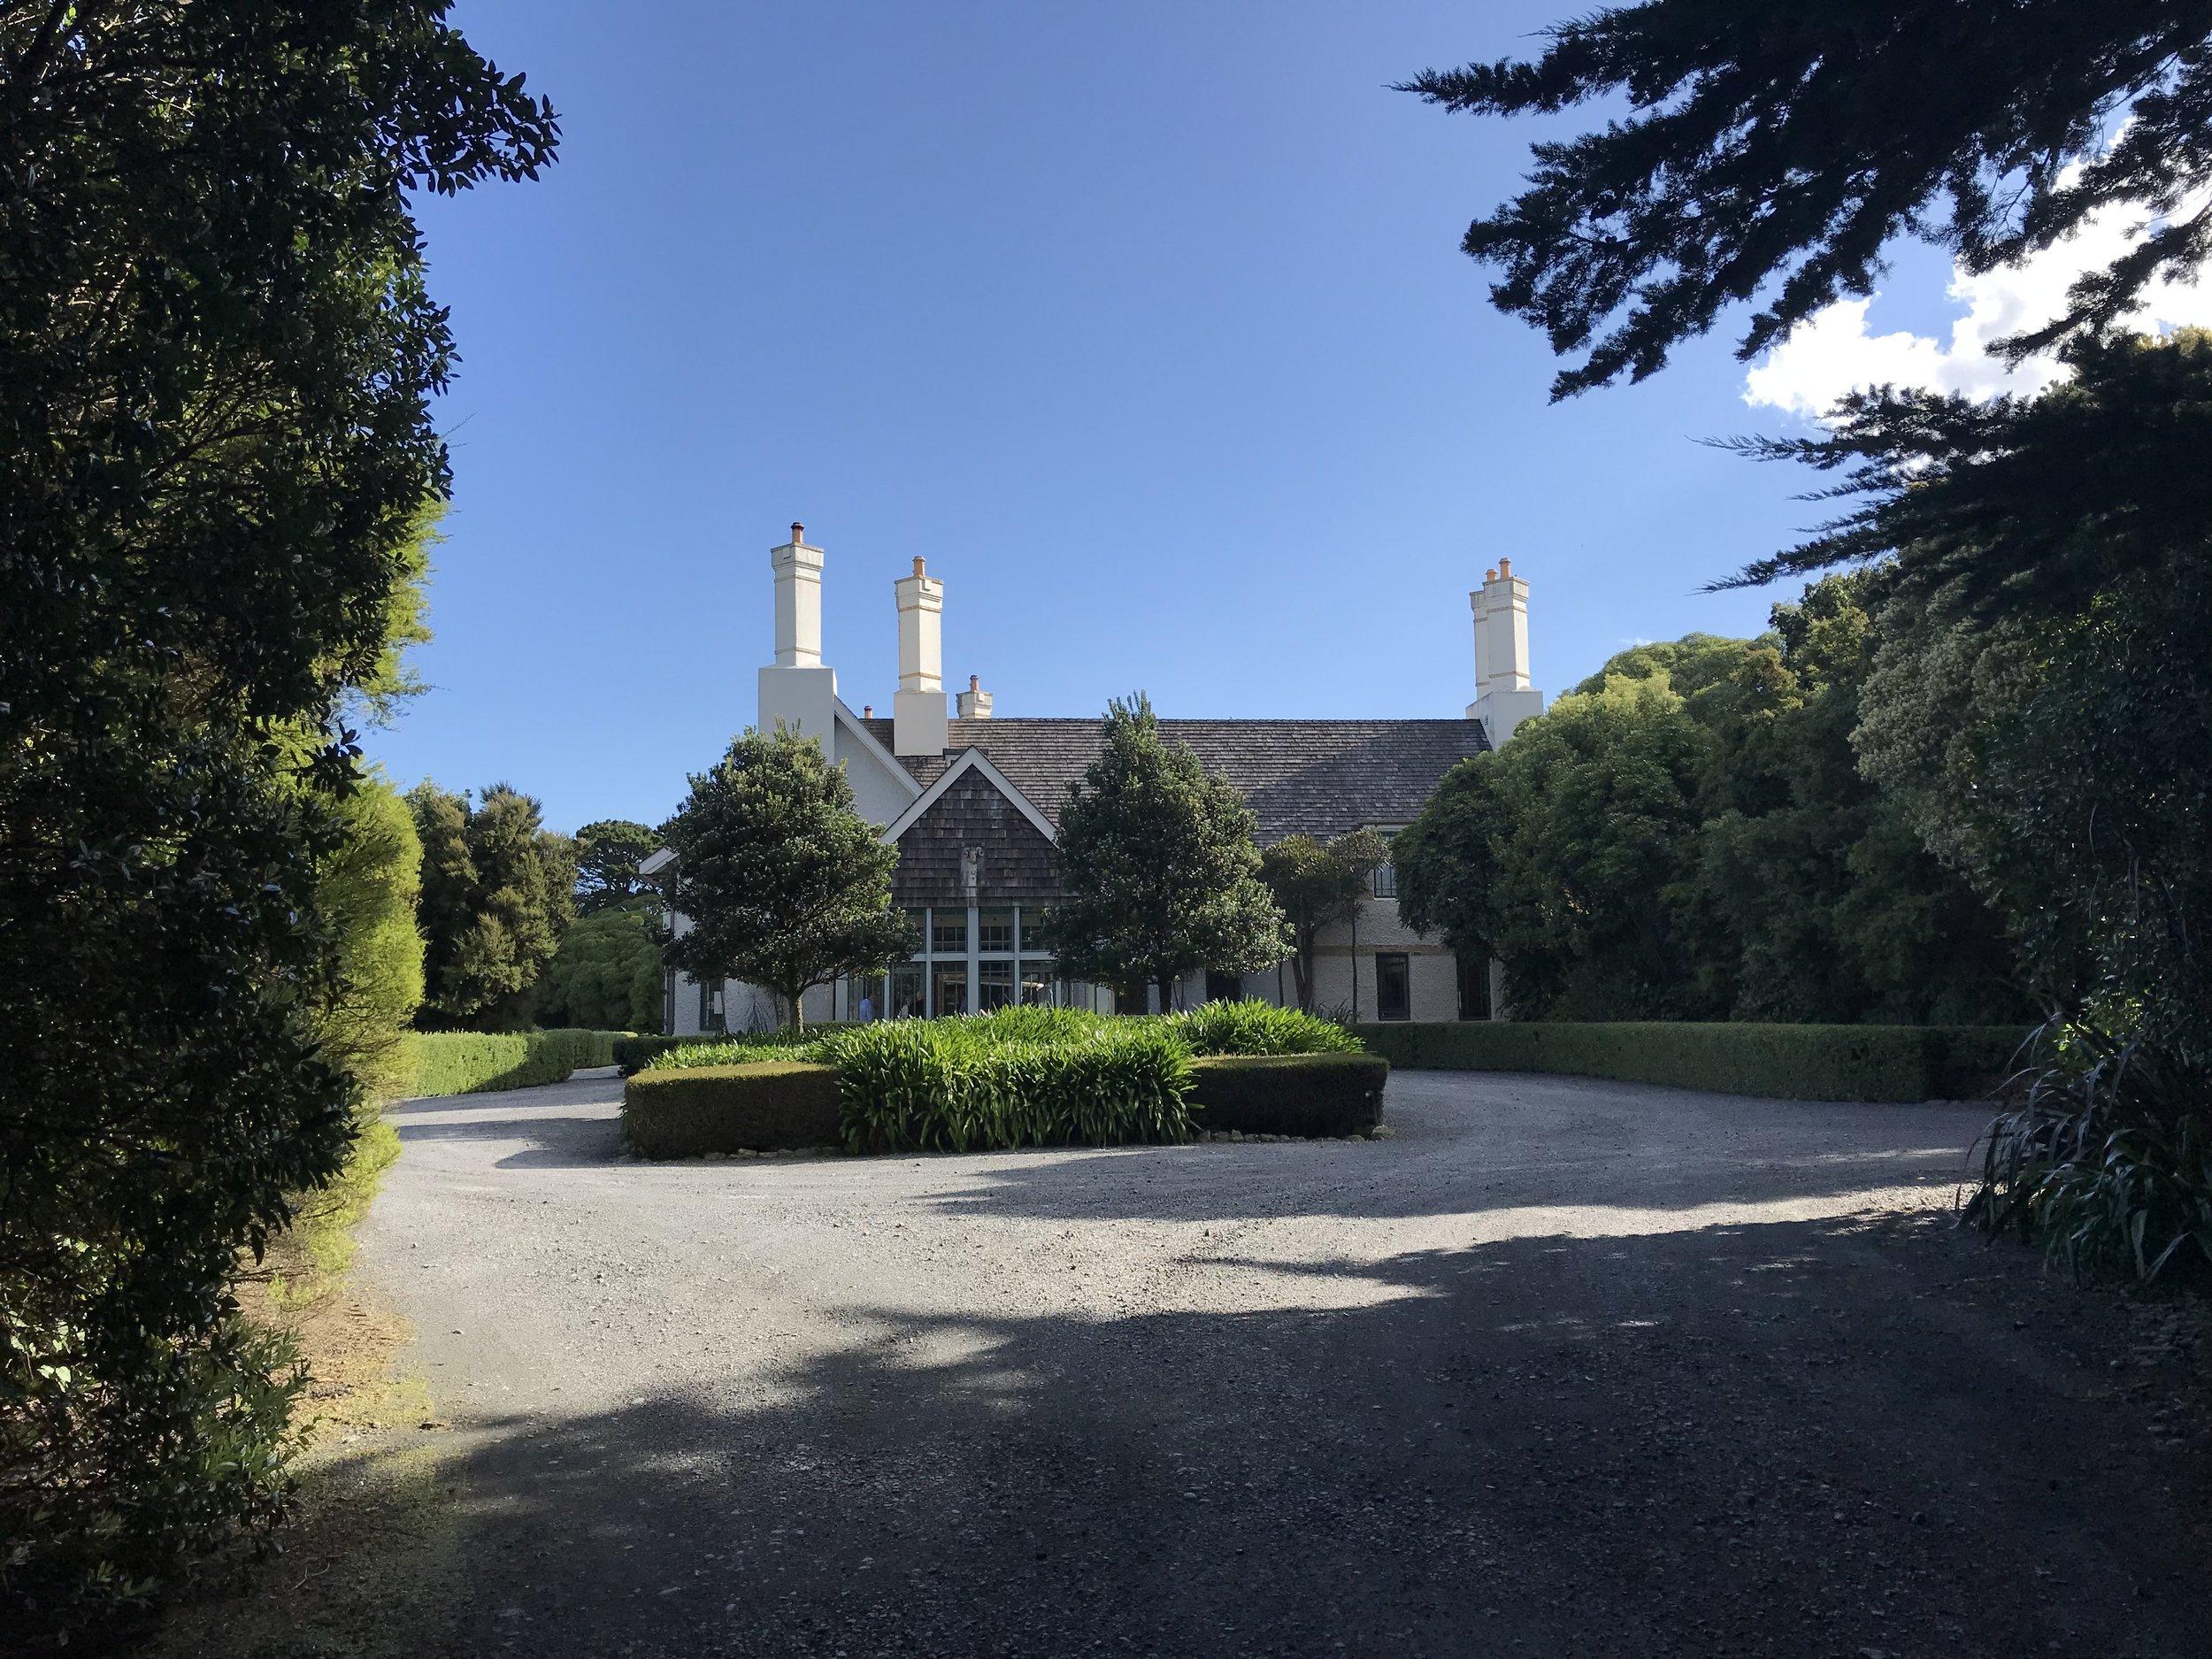 Wharekauhau Luxury Lodge, Wairarapa, New Zealand (image by Jacqui Gibson).